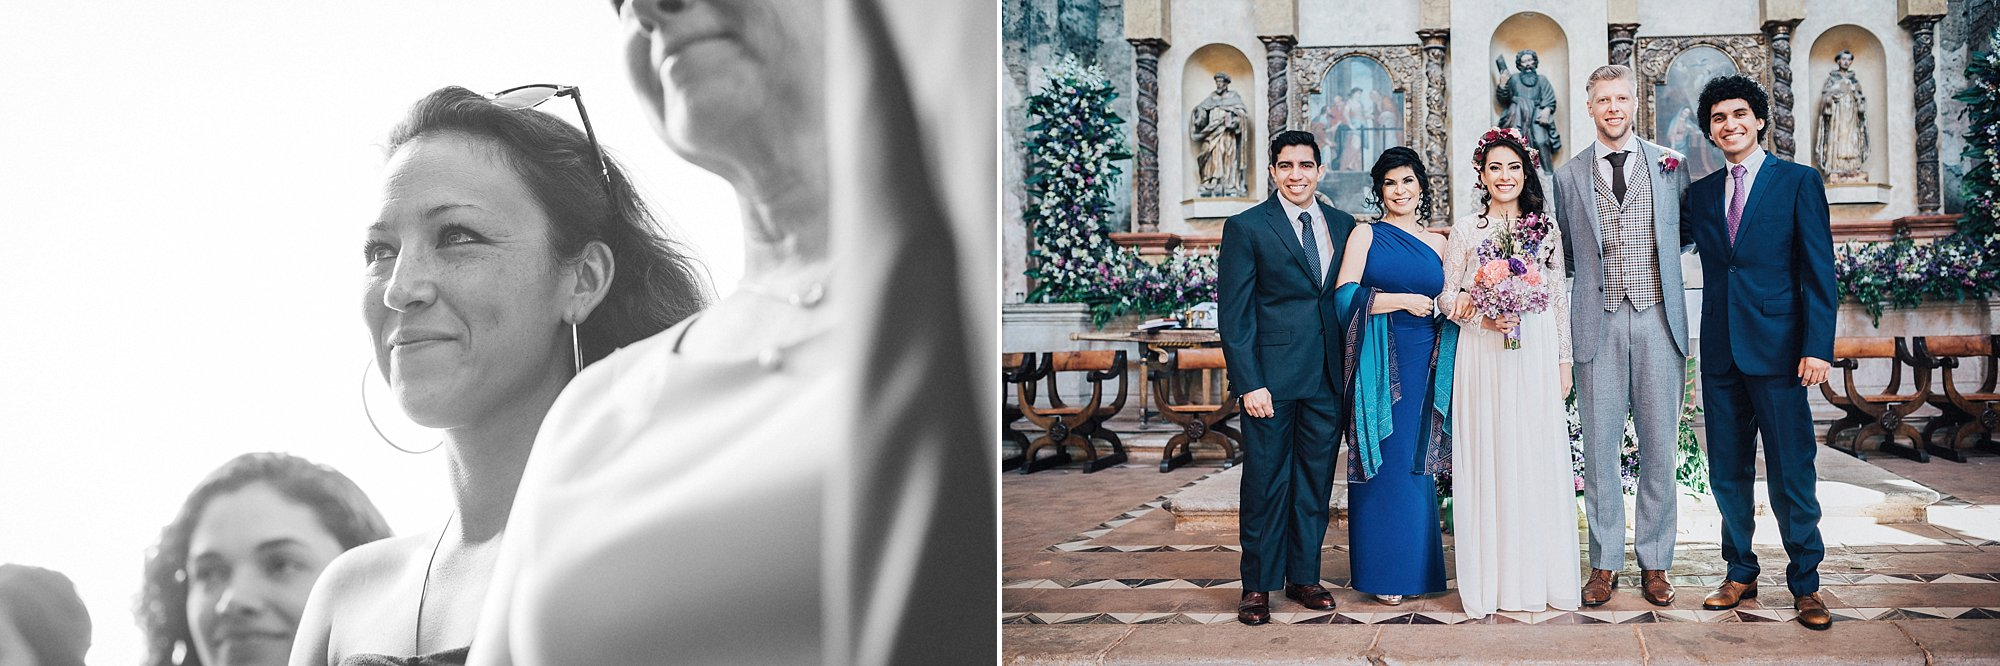 alex-yazmin-wedding-photographer-antigua-guatemala-087